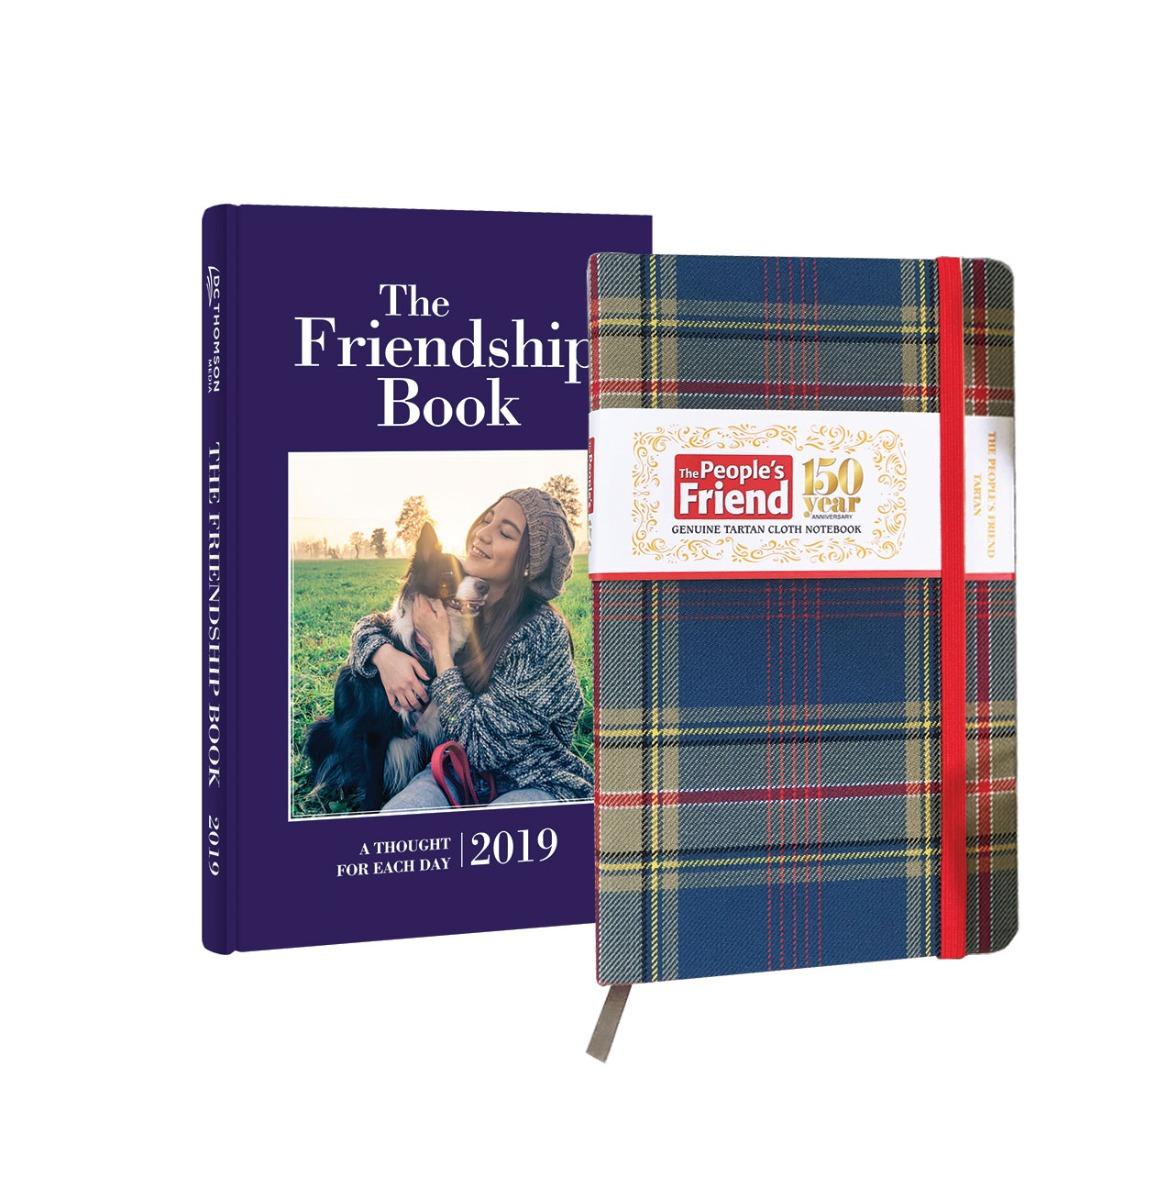 The People's Friend Tartan Notebook & 2019 Friendship Book Pack